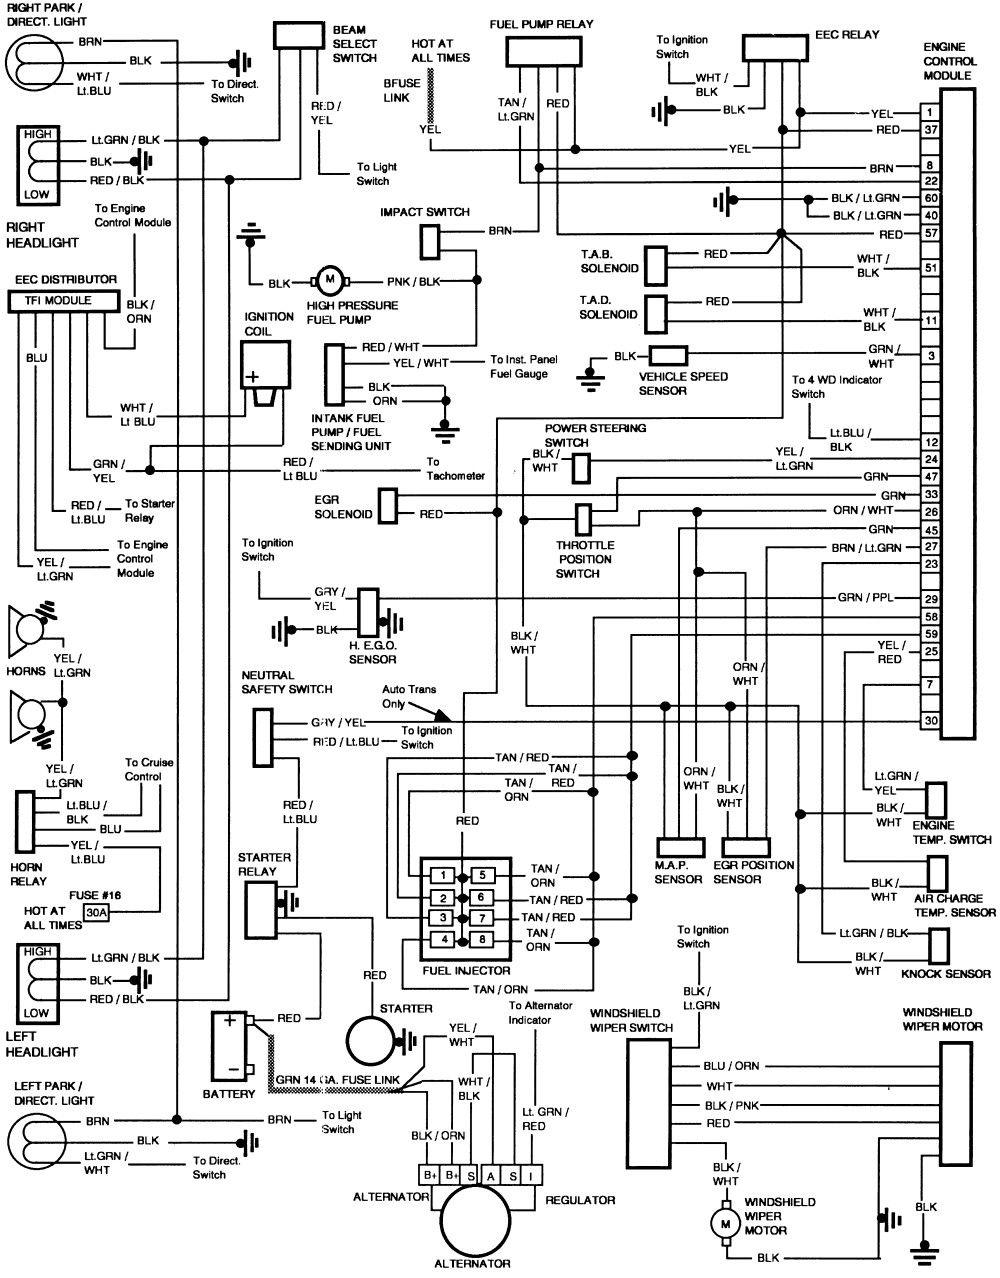 [DIAGRAM] 2015 F250 Super Duty Upfitter Wiring Diagram